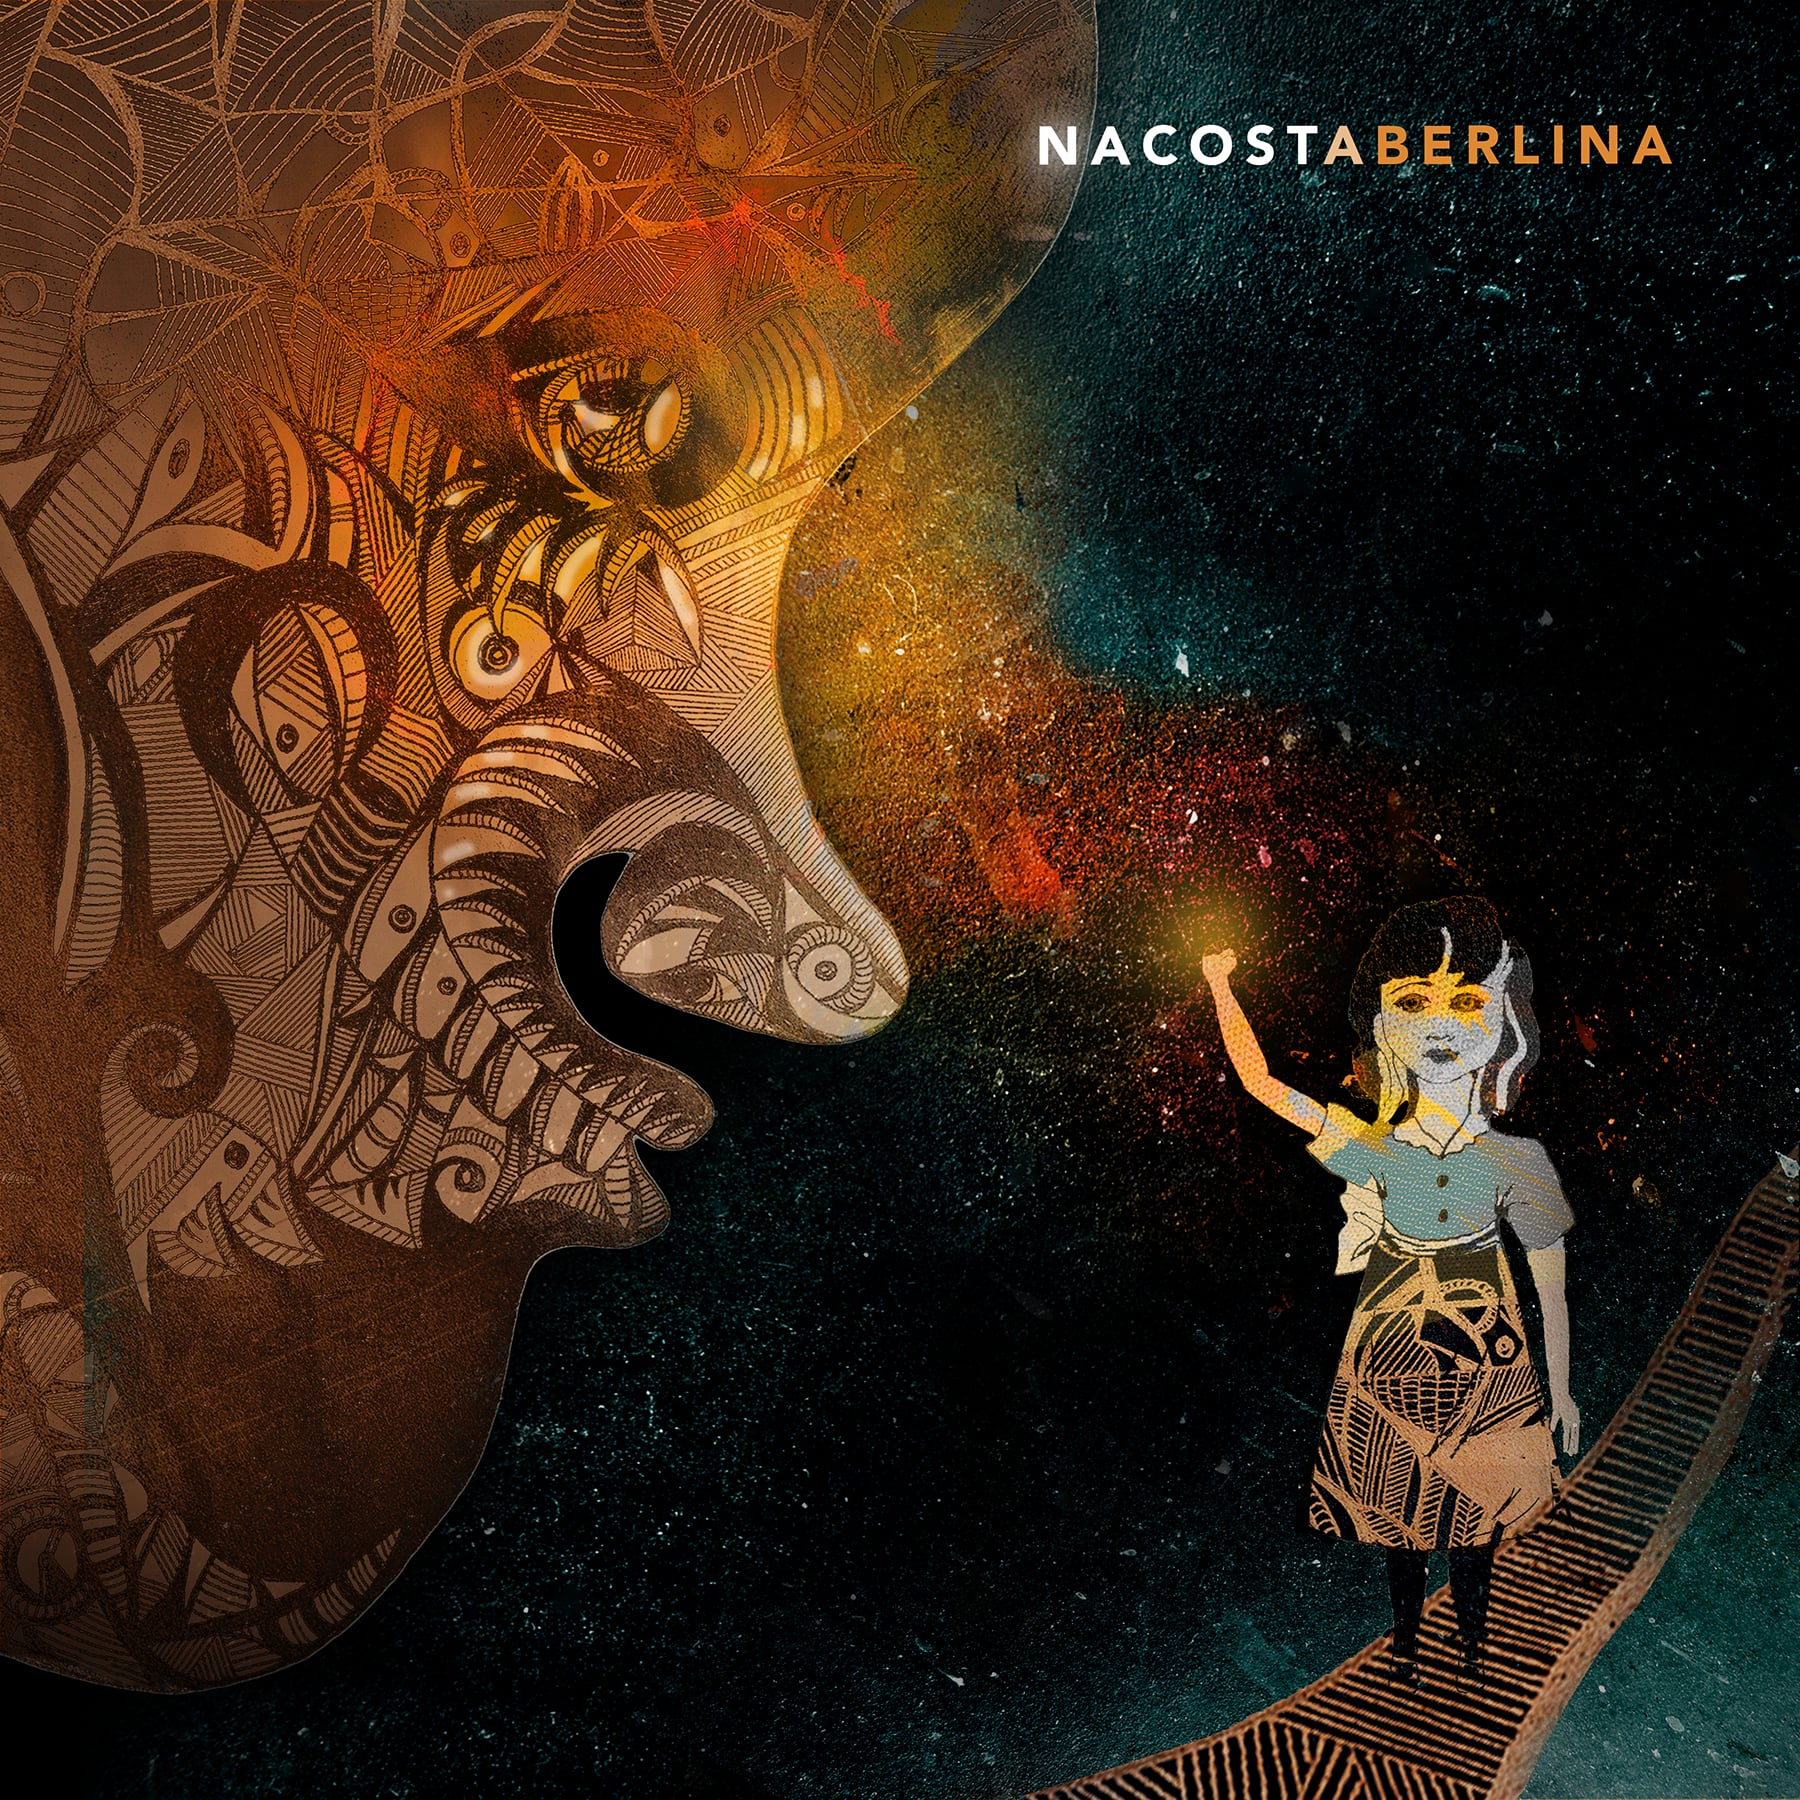 Nacosta-aberlina-4.jpg